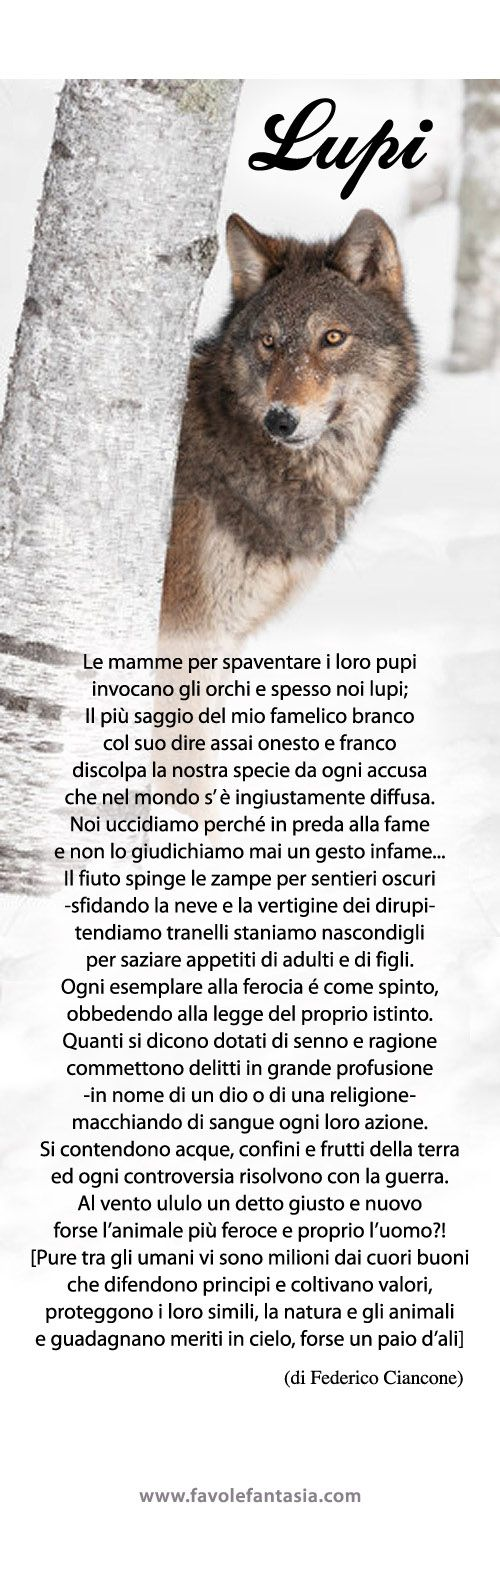 Lupi_Federico-Ciancone.jpg 500×1.575 pixel